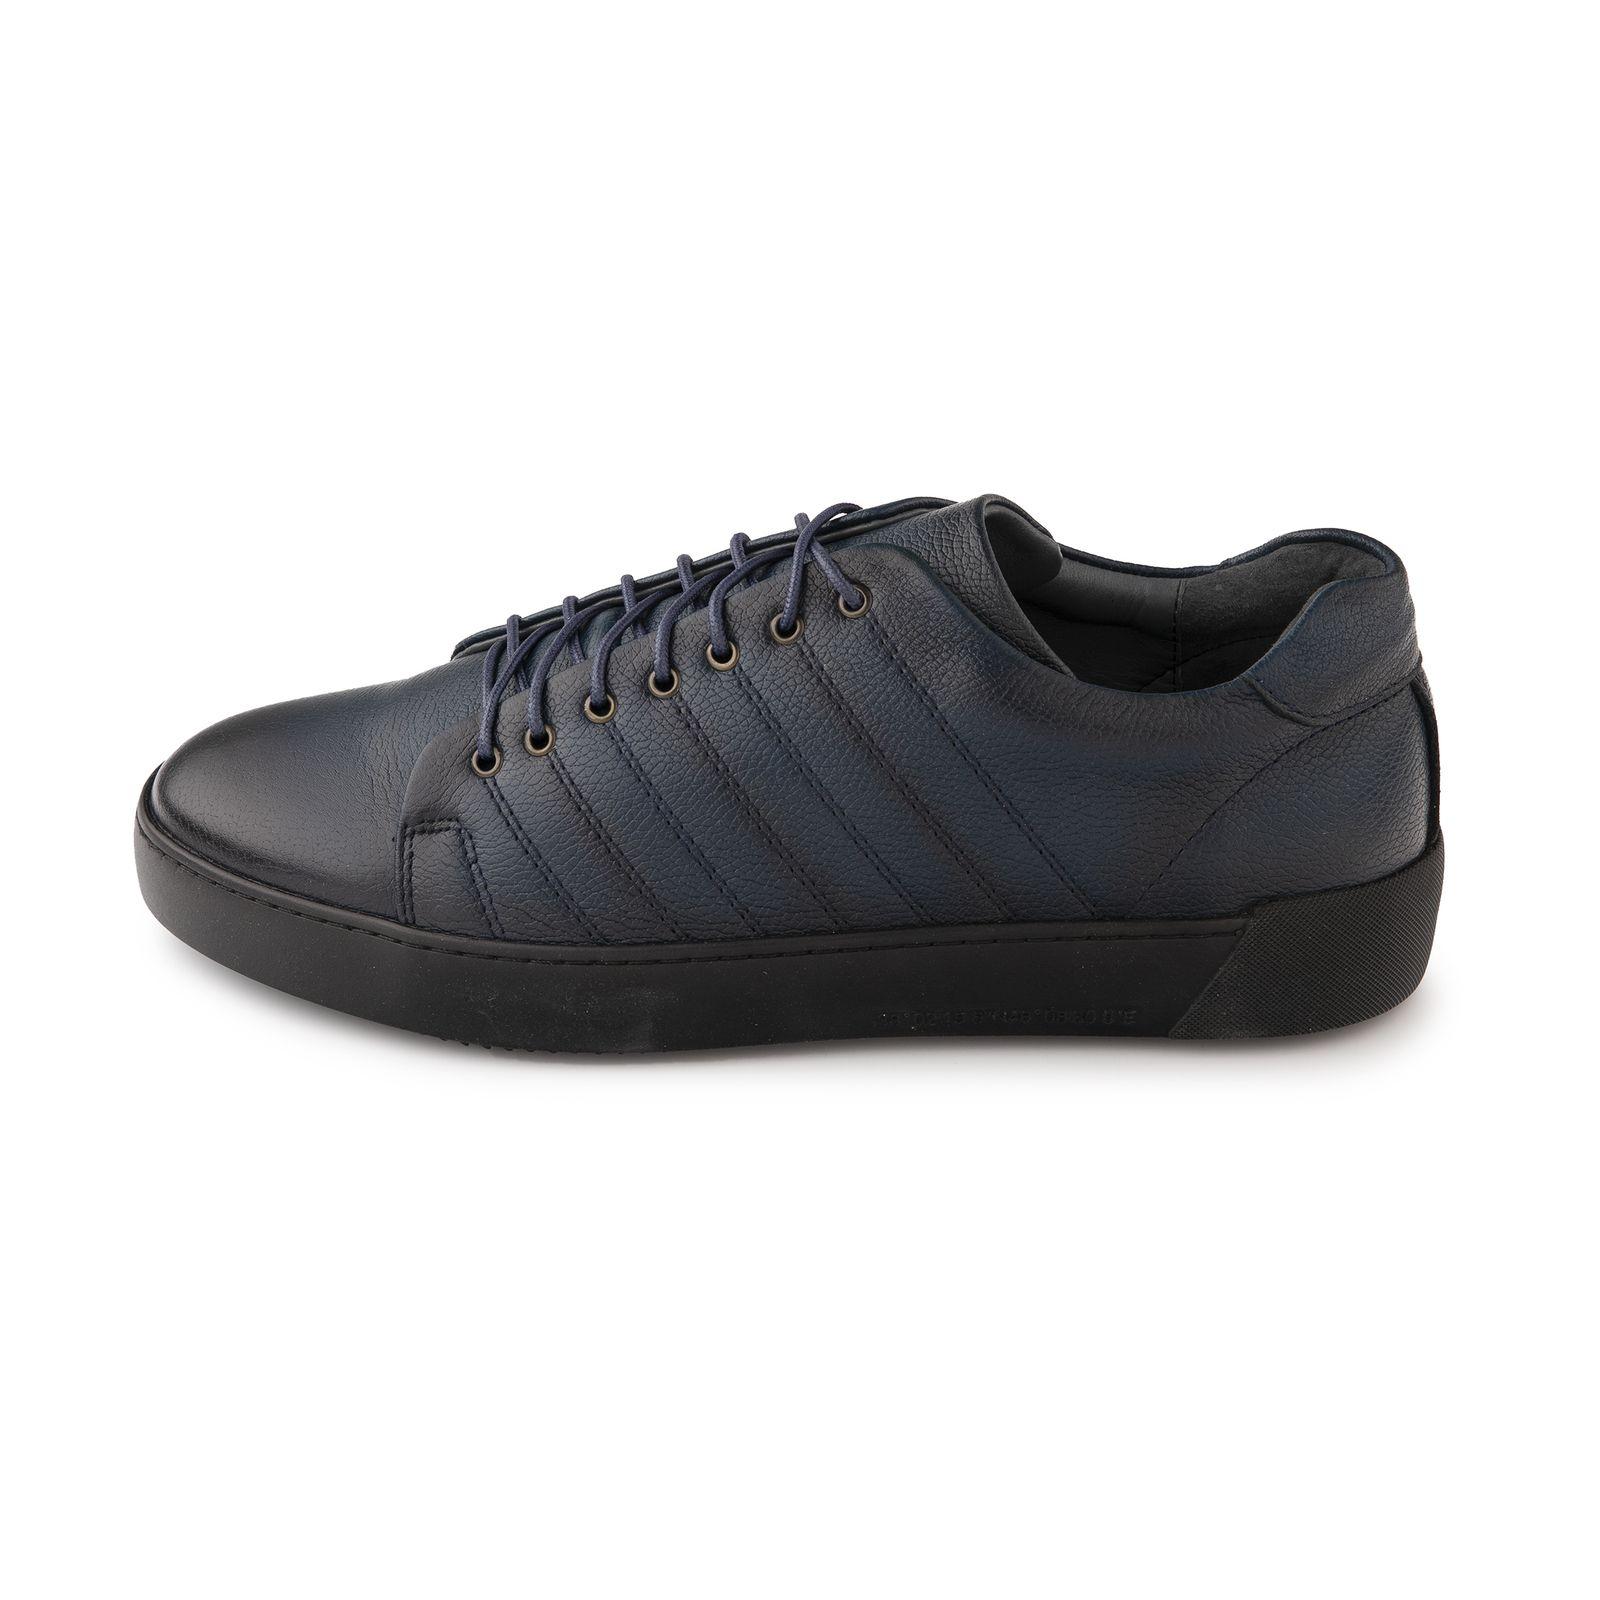 کفش روزمره مردانه شیفر مدل 7359A503103 -  - 2